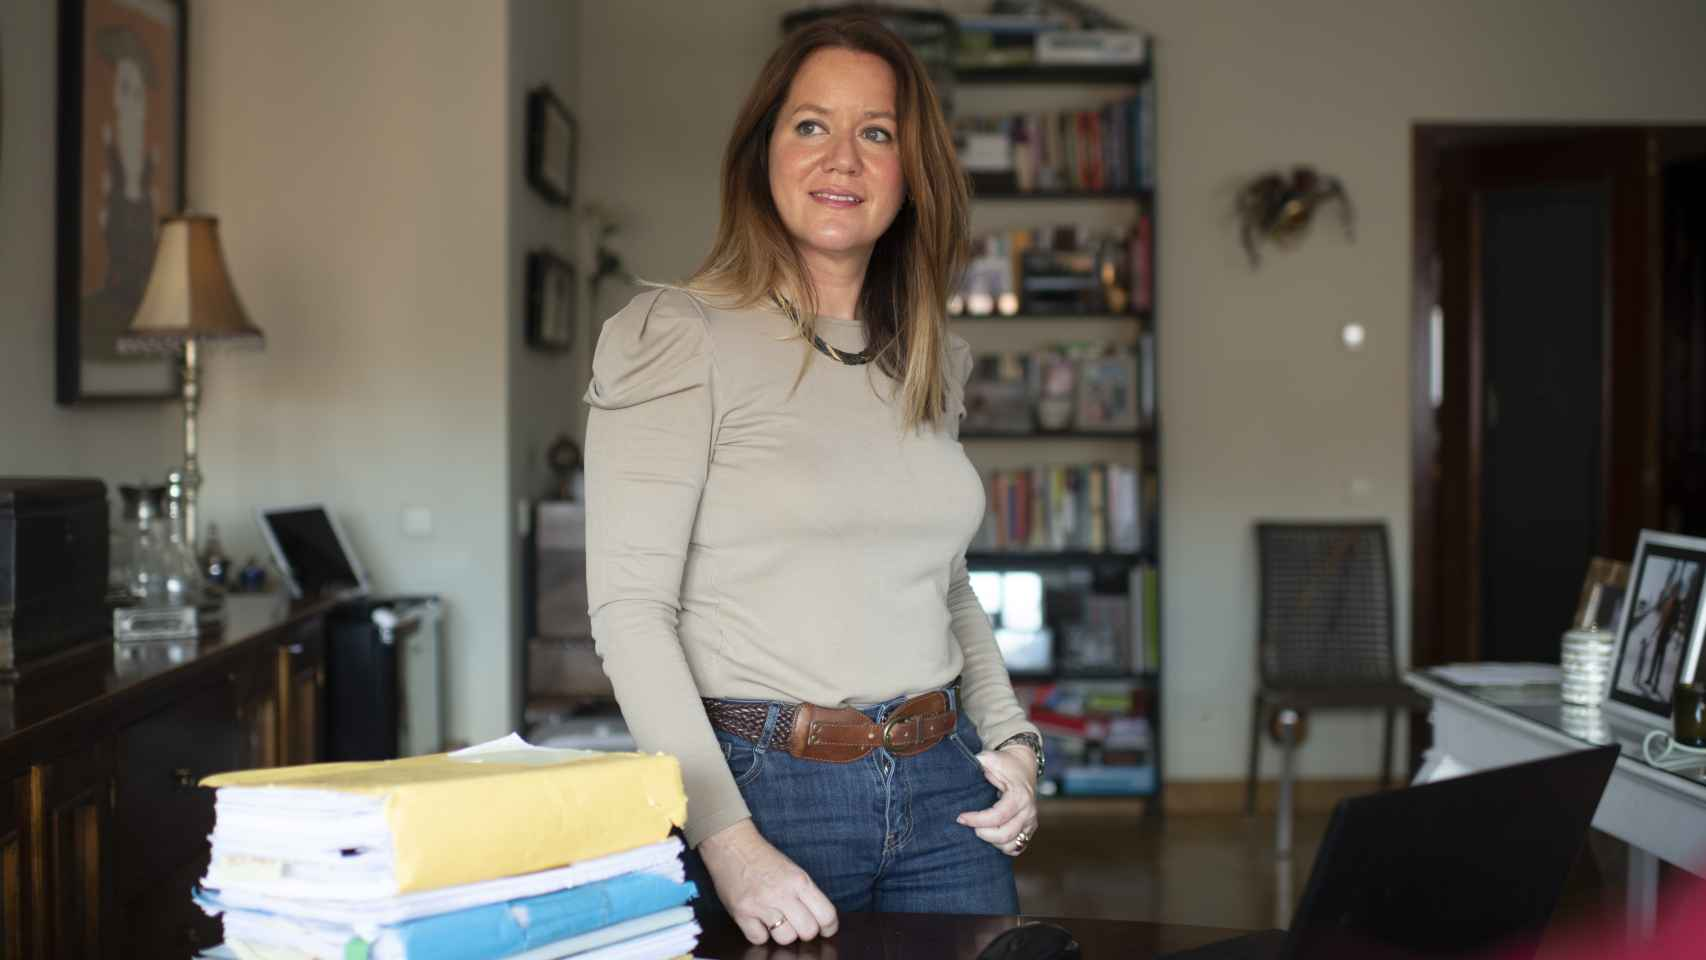 Natalia Velilla es magistrada de Familia en el Juzgado de Primera Instancia nº 7 de Móstoles.